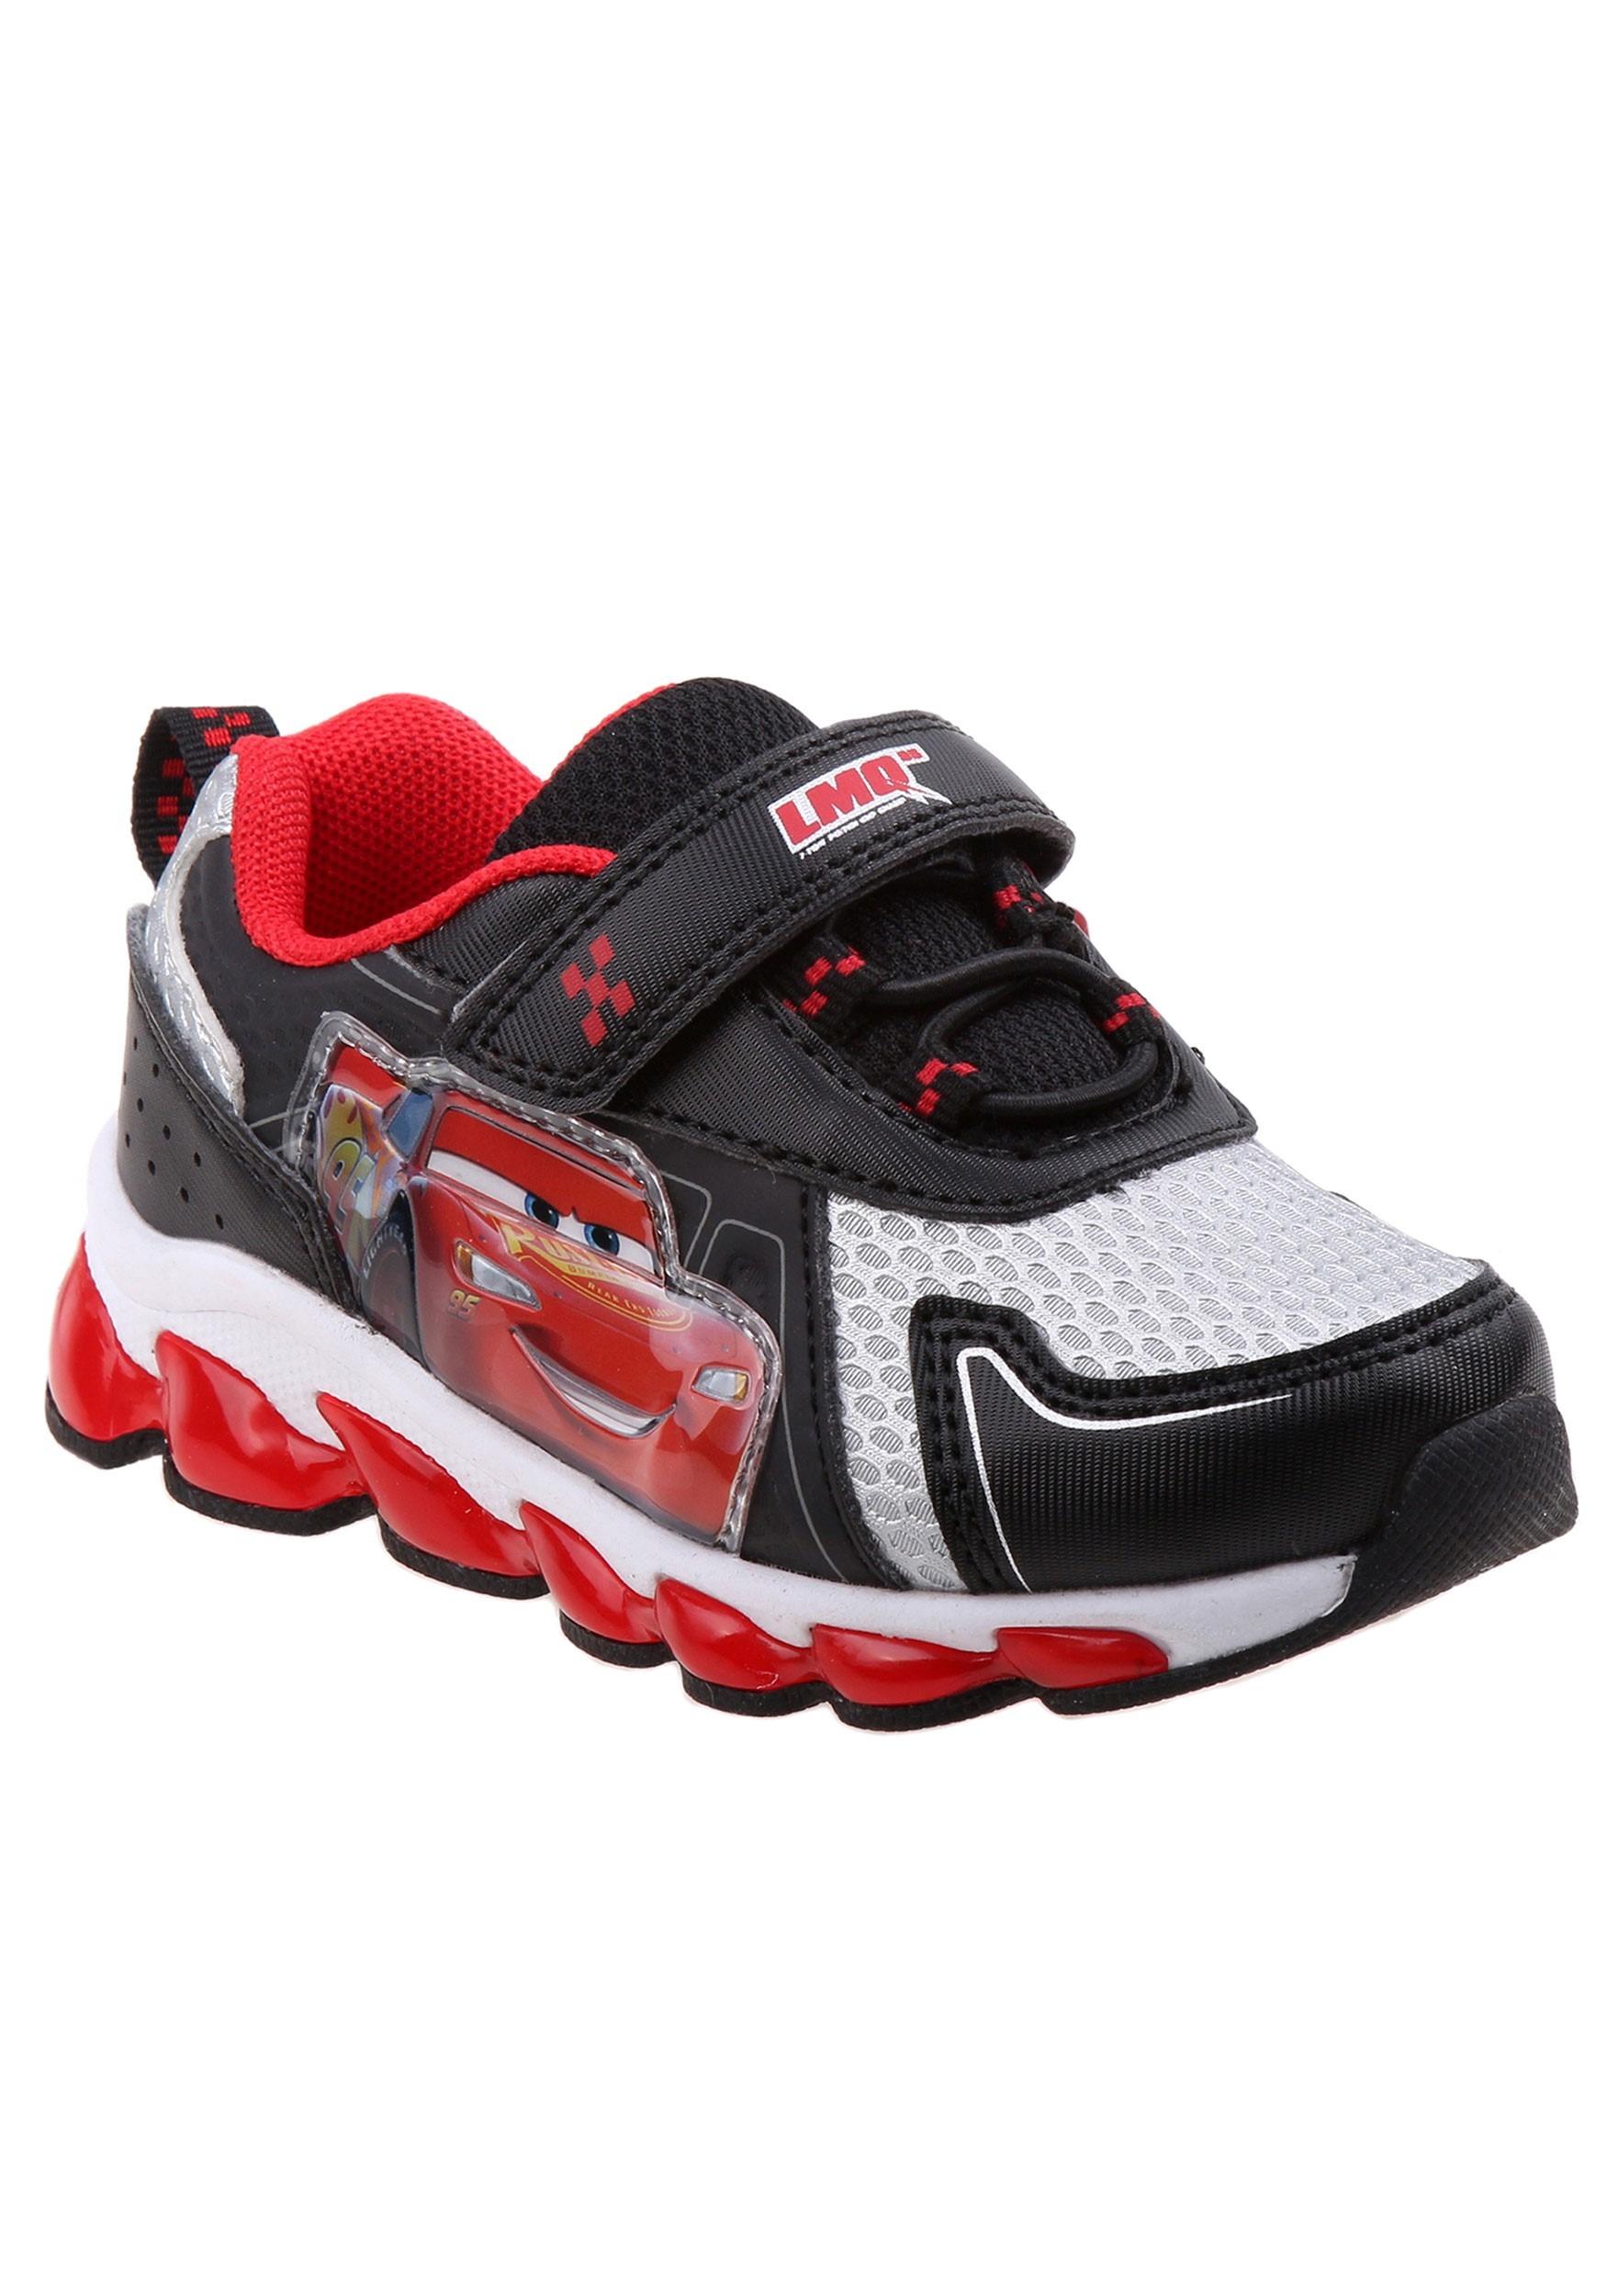 Cars Lightning McQueen Sneakers for Boys